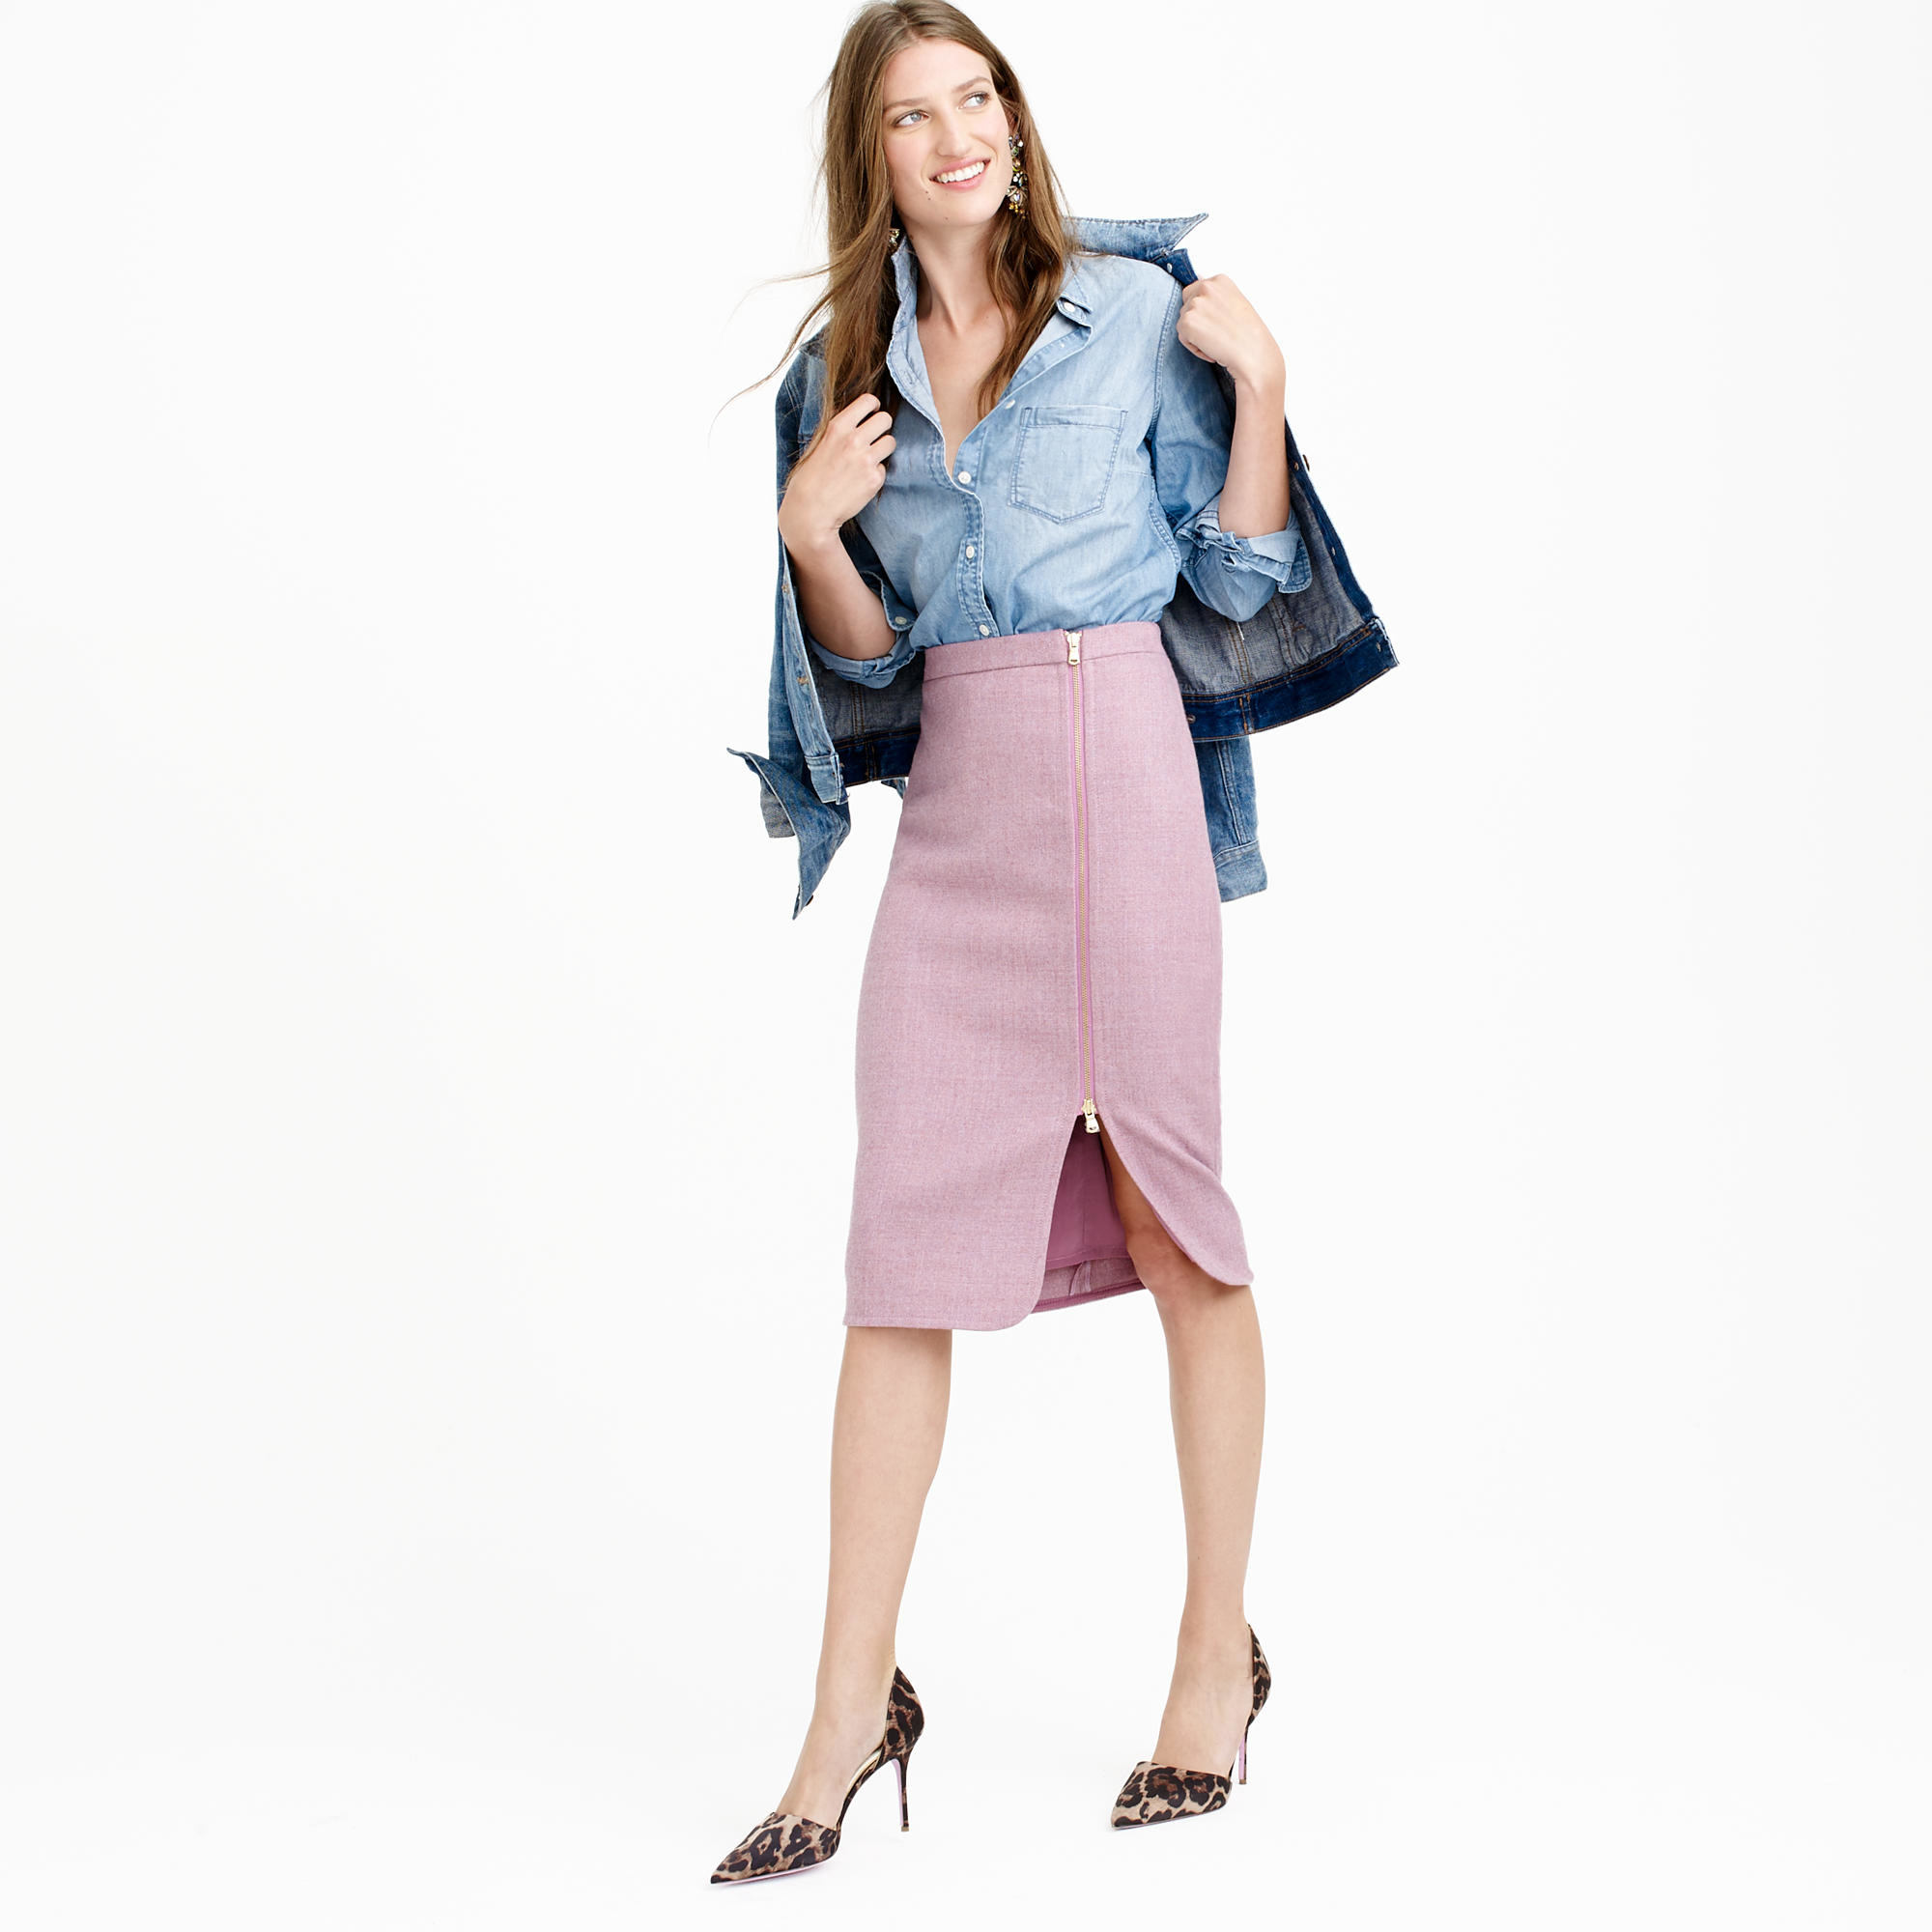 j crew wool zip pencil skirt in pink